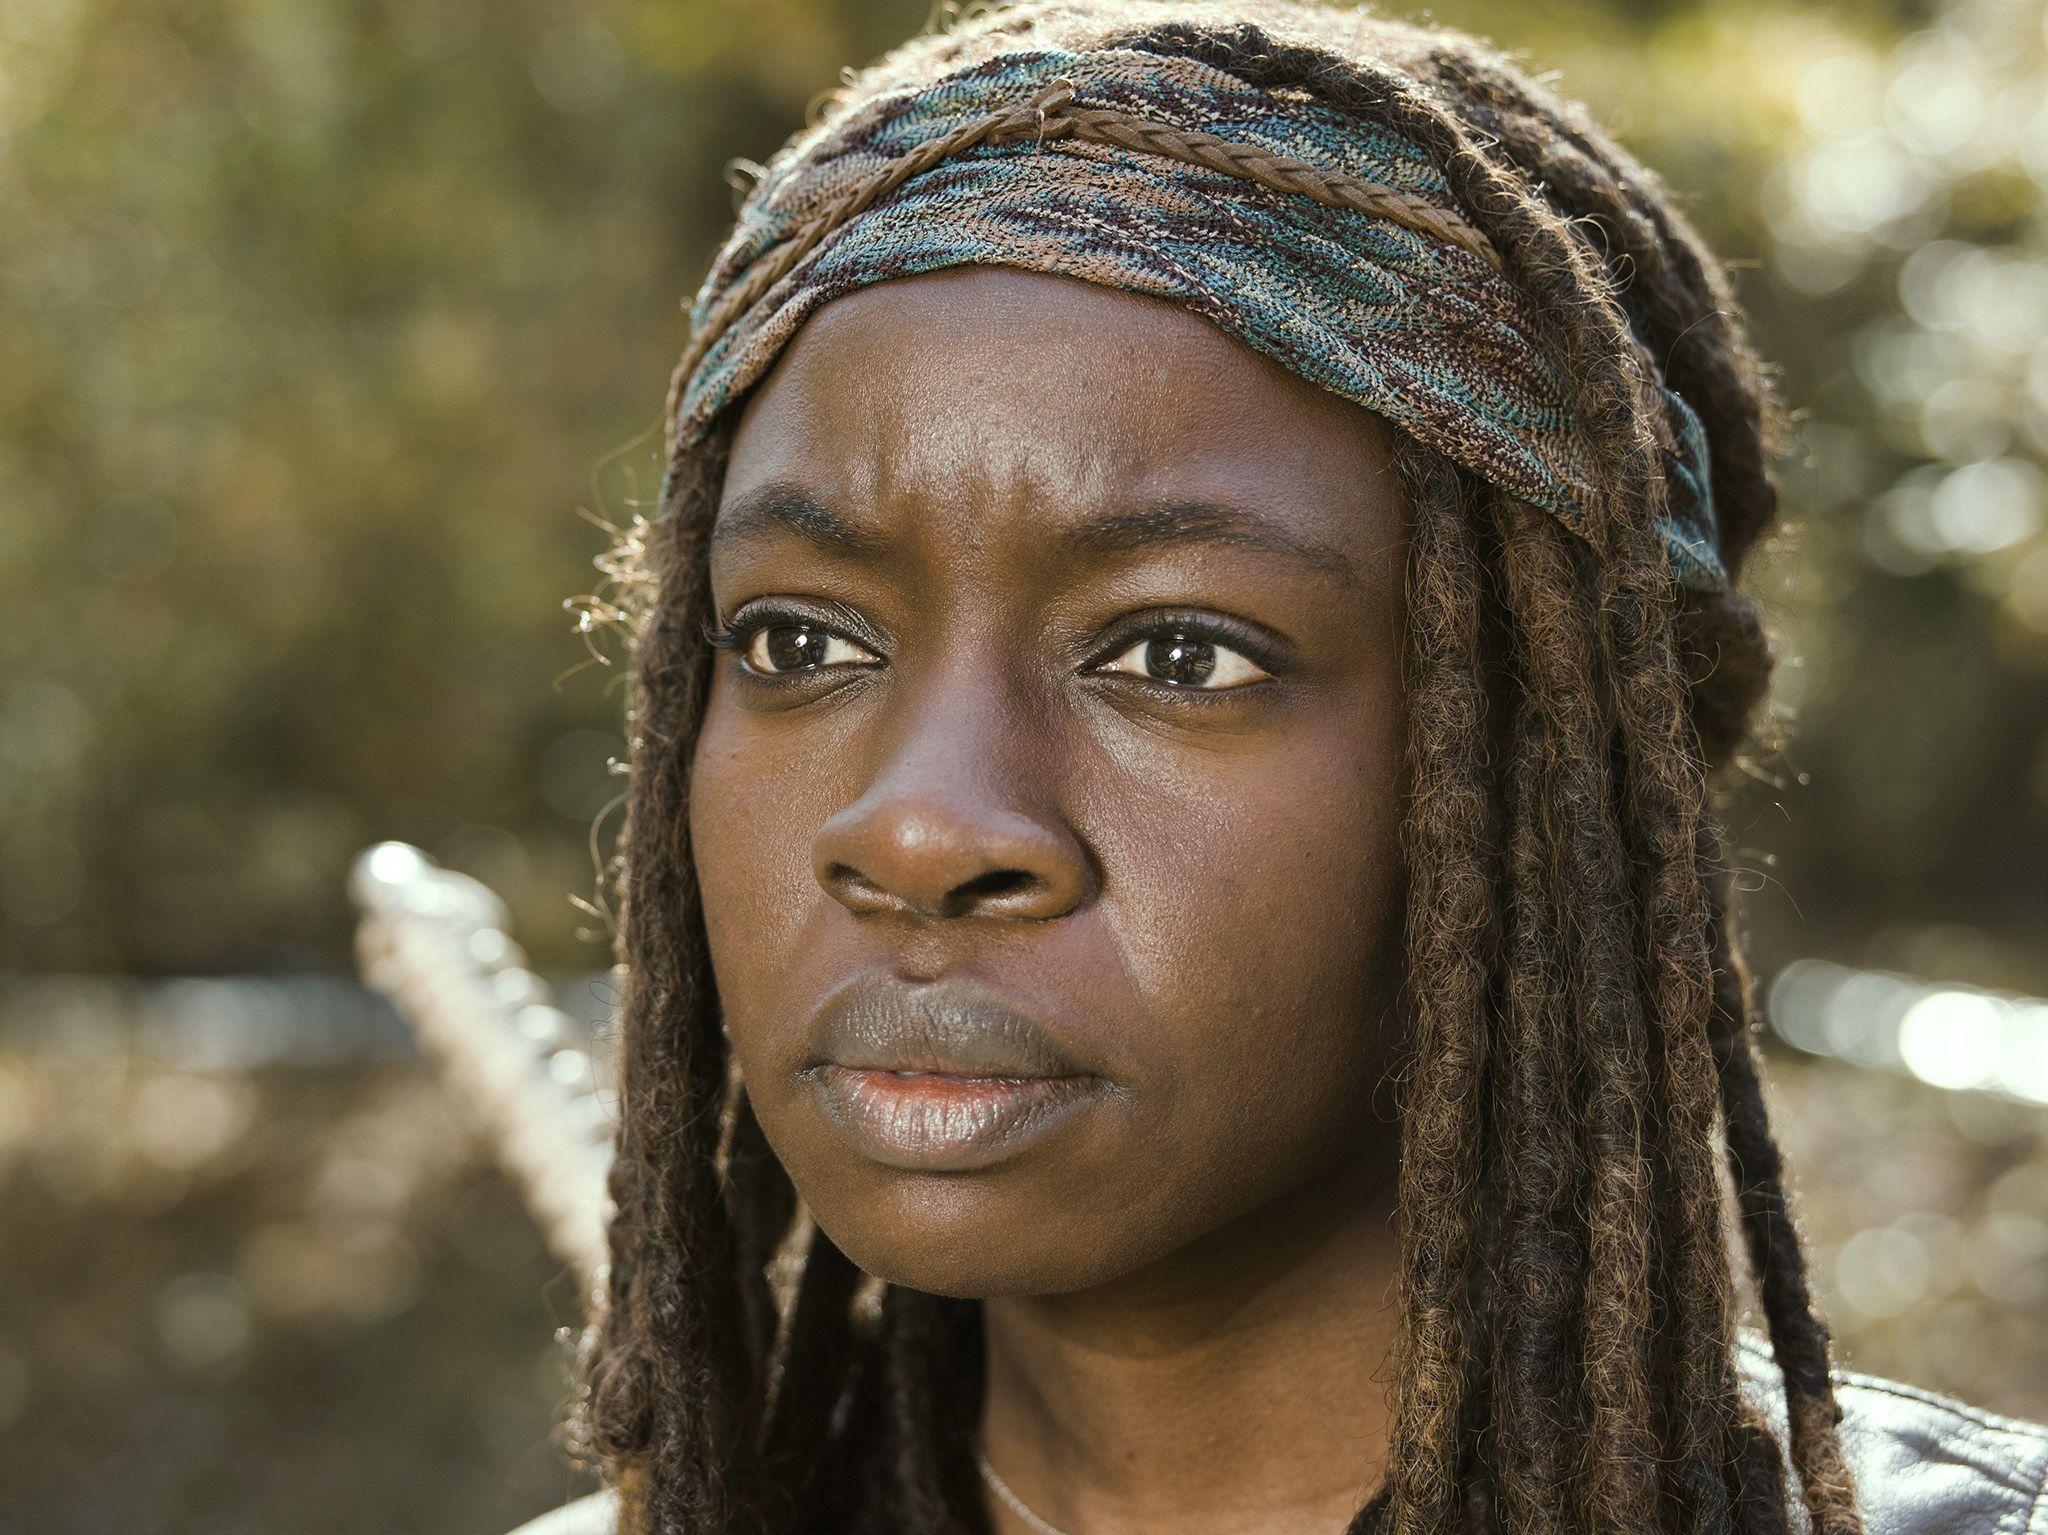 Walking Dead producer drops hints about Michonne's exit in season 10